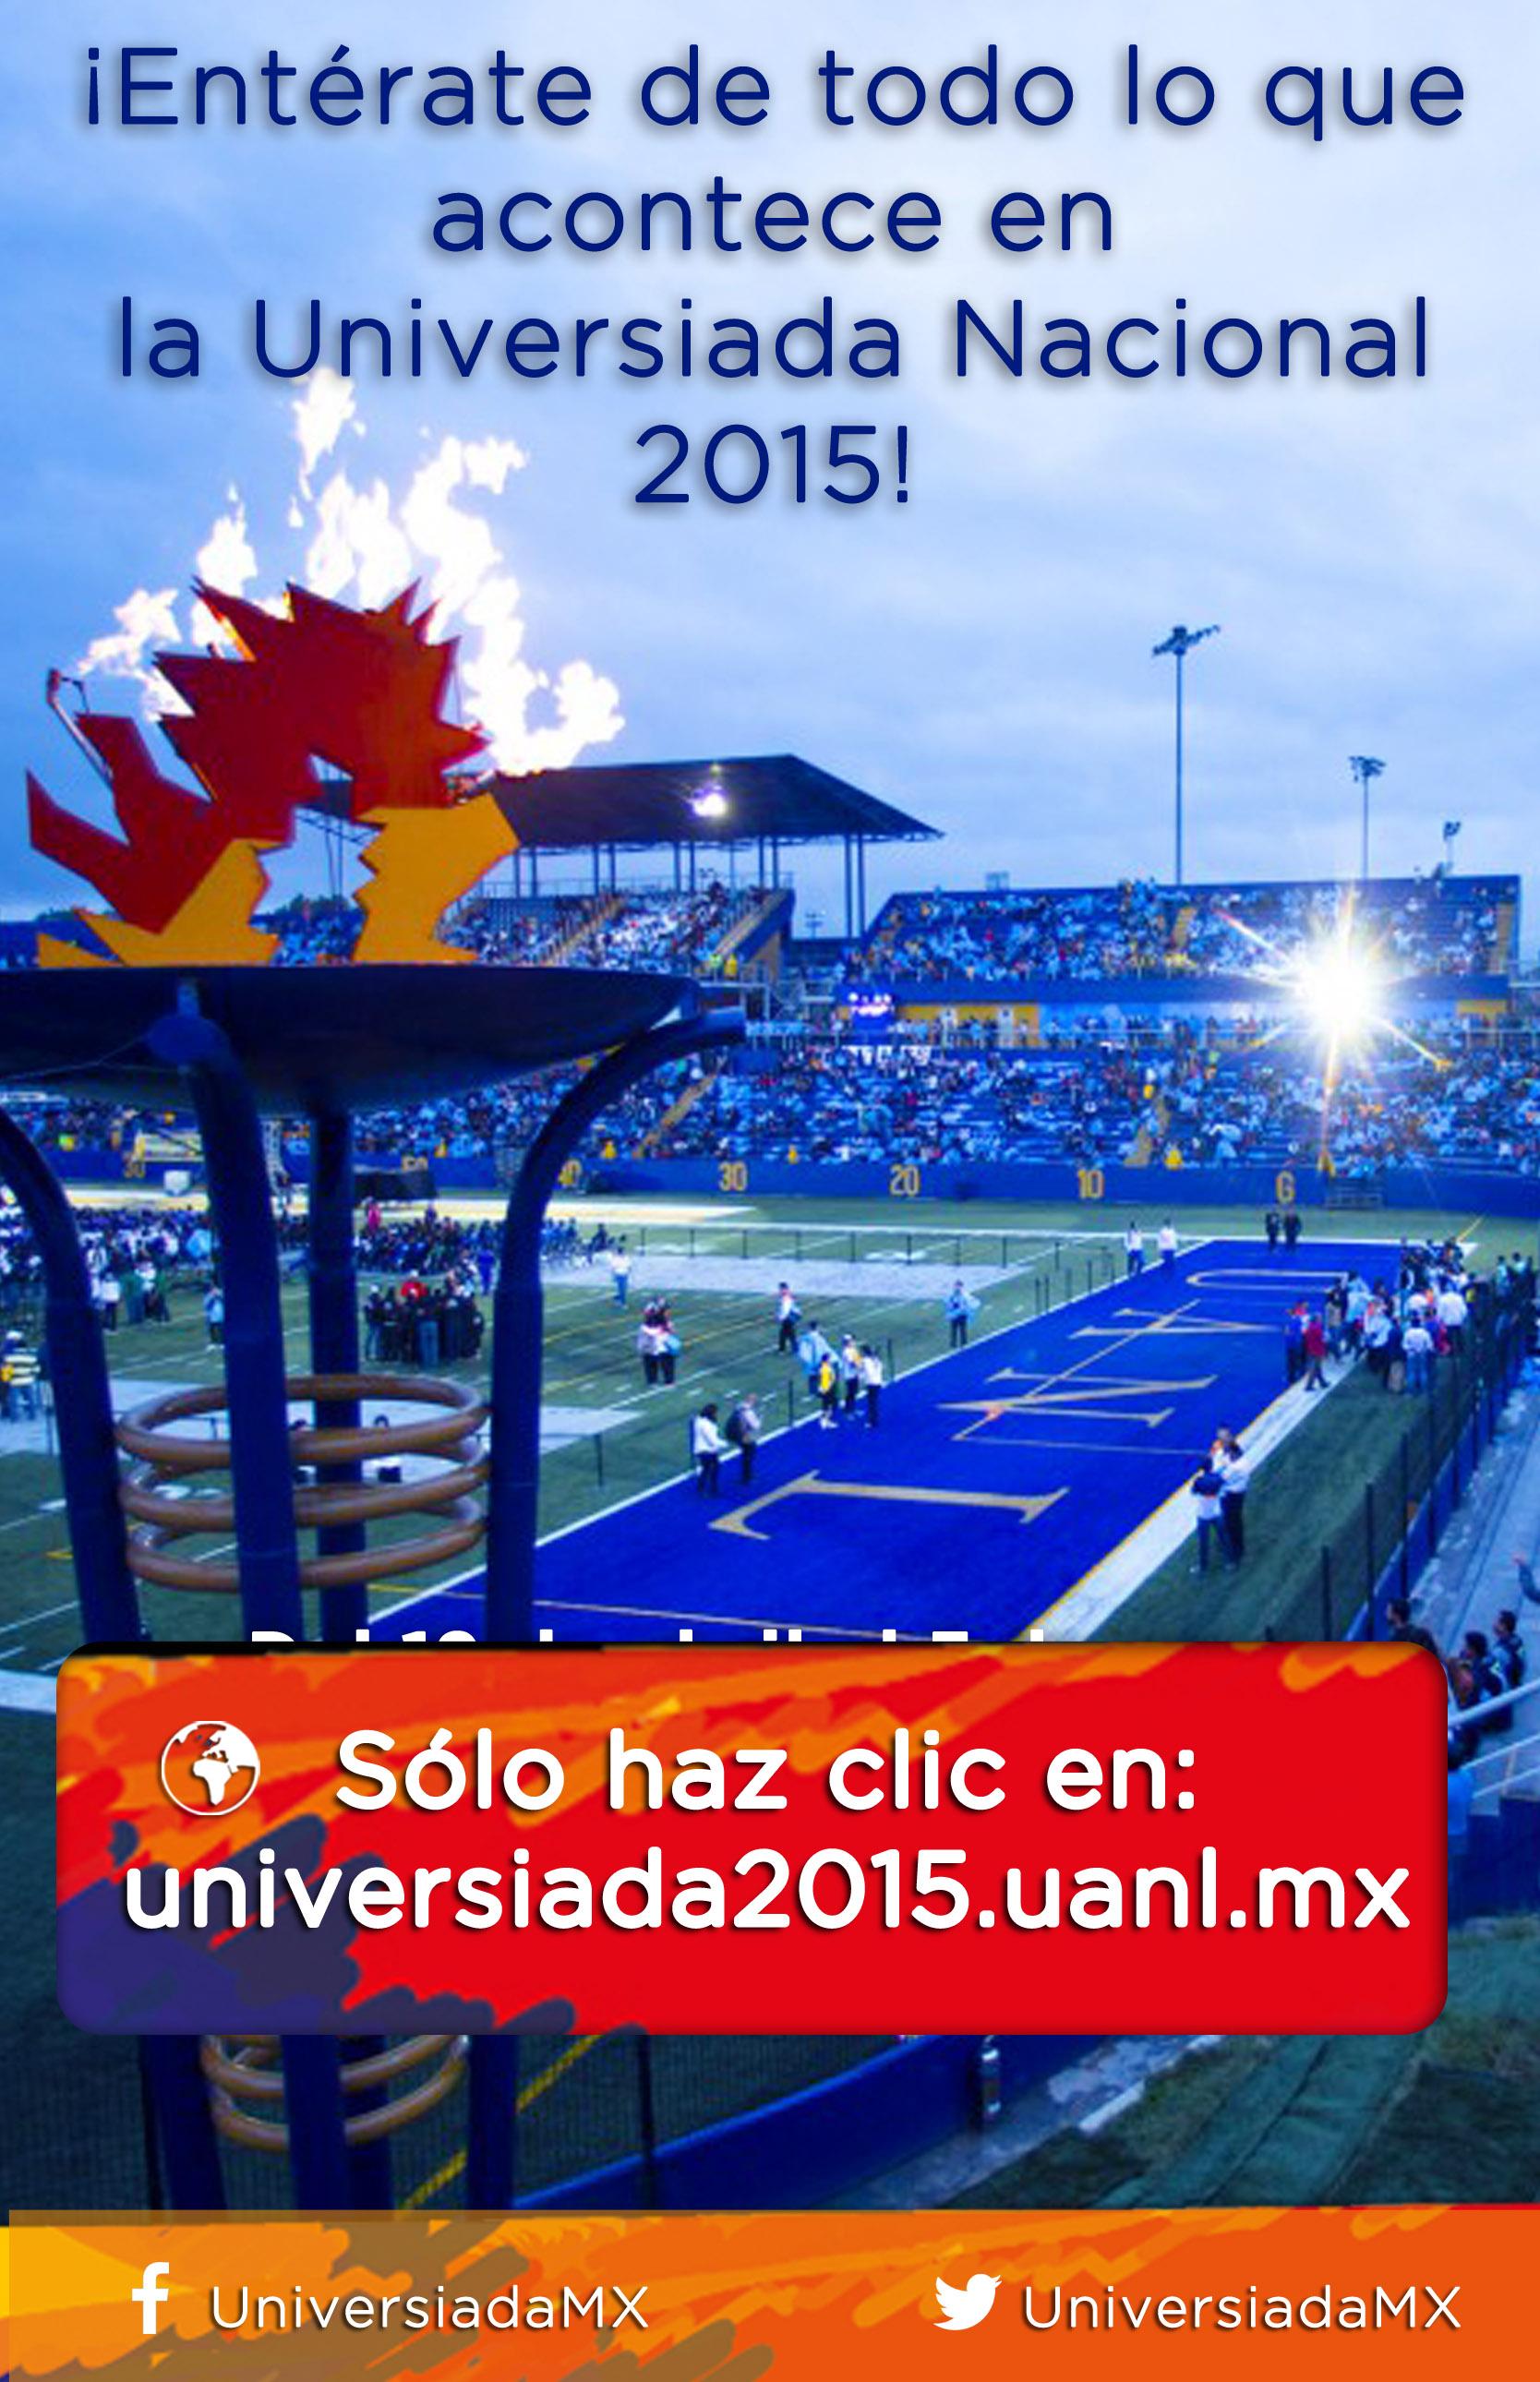 UNIVERSIADA 2015